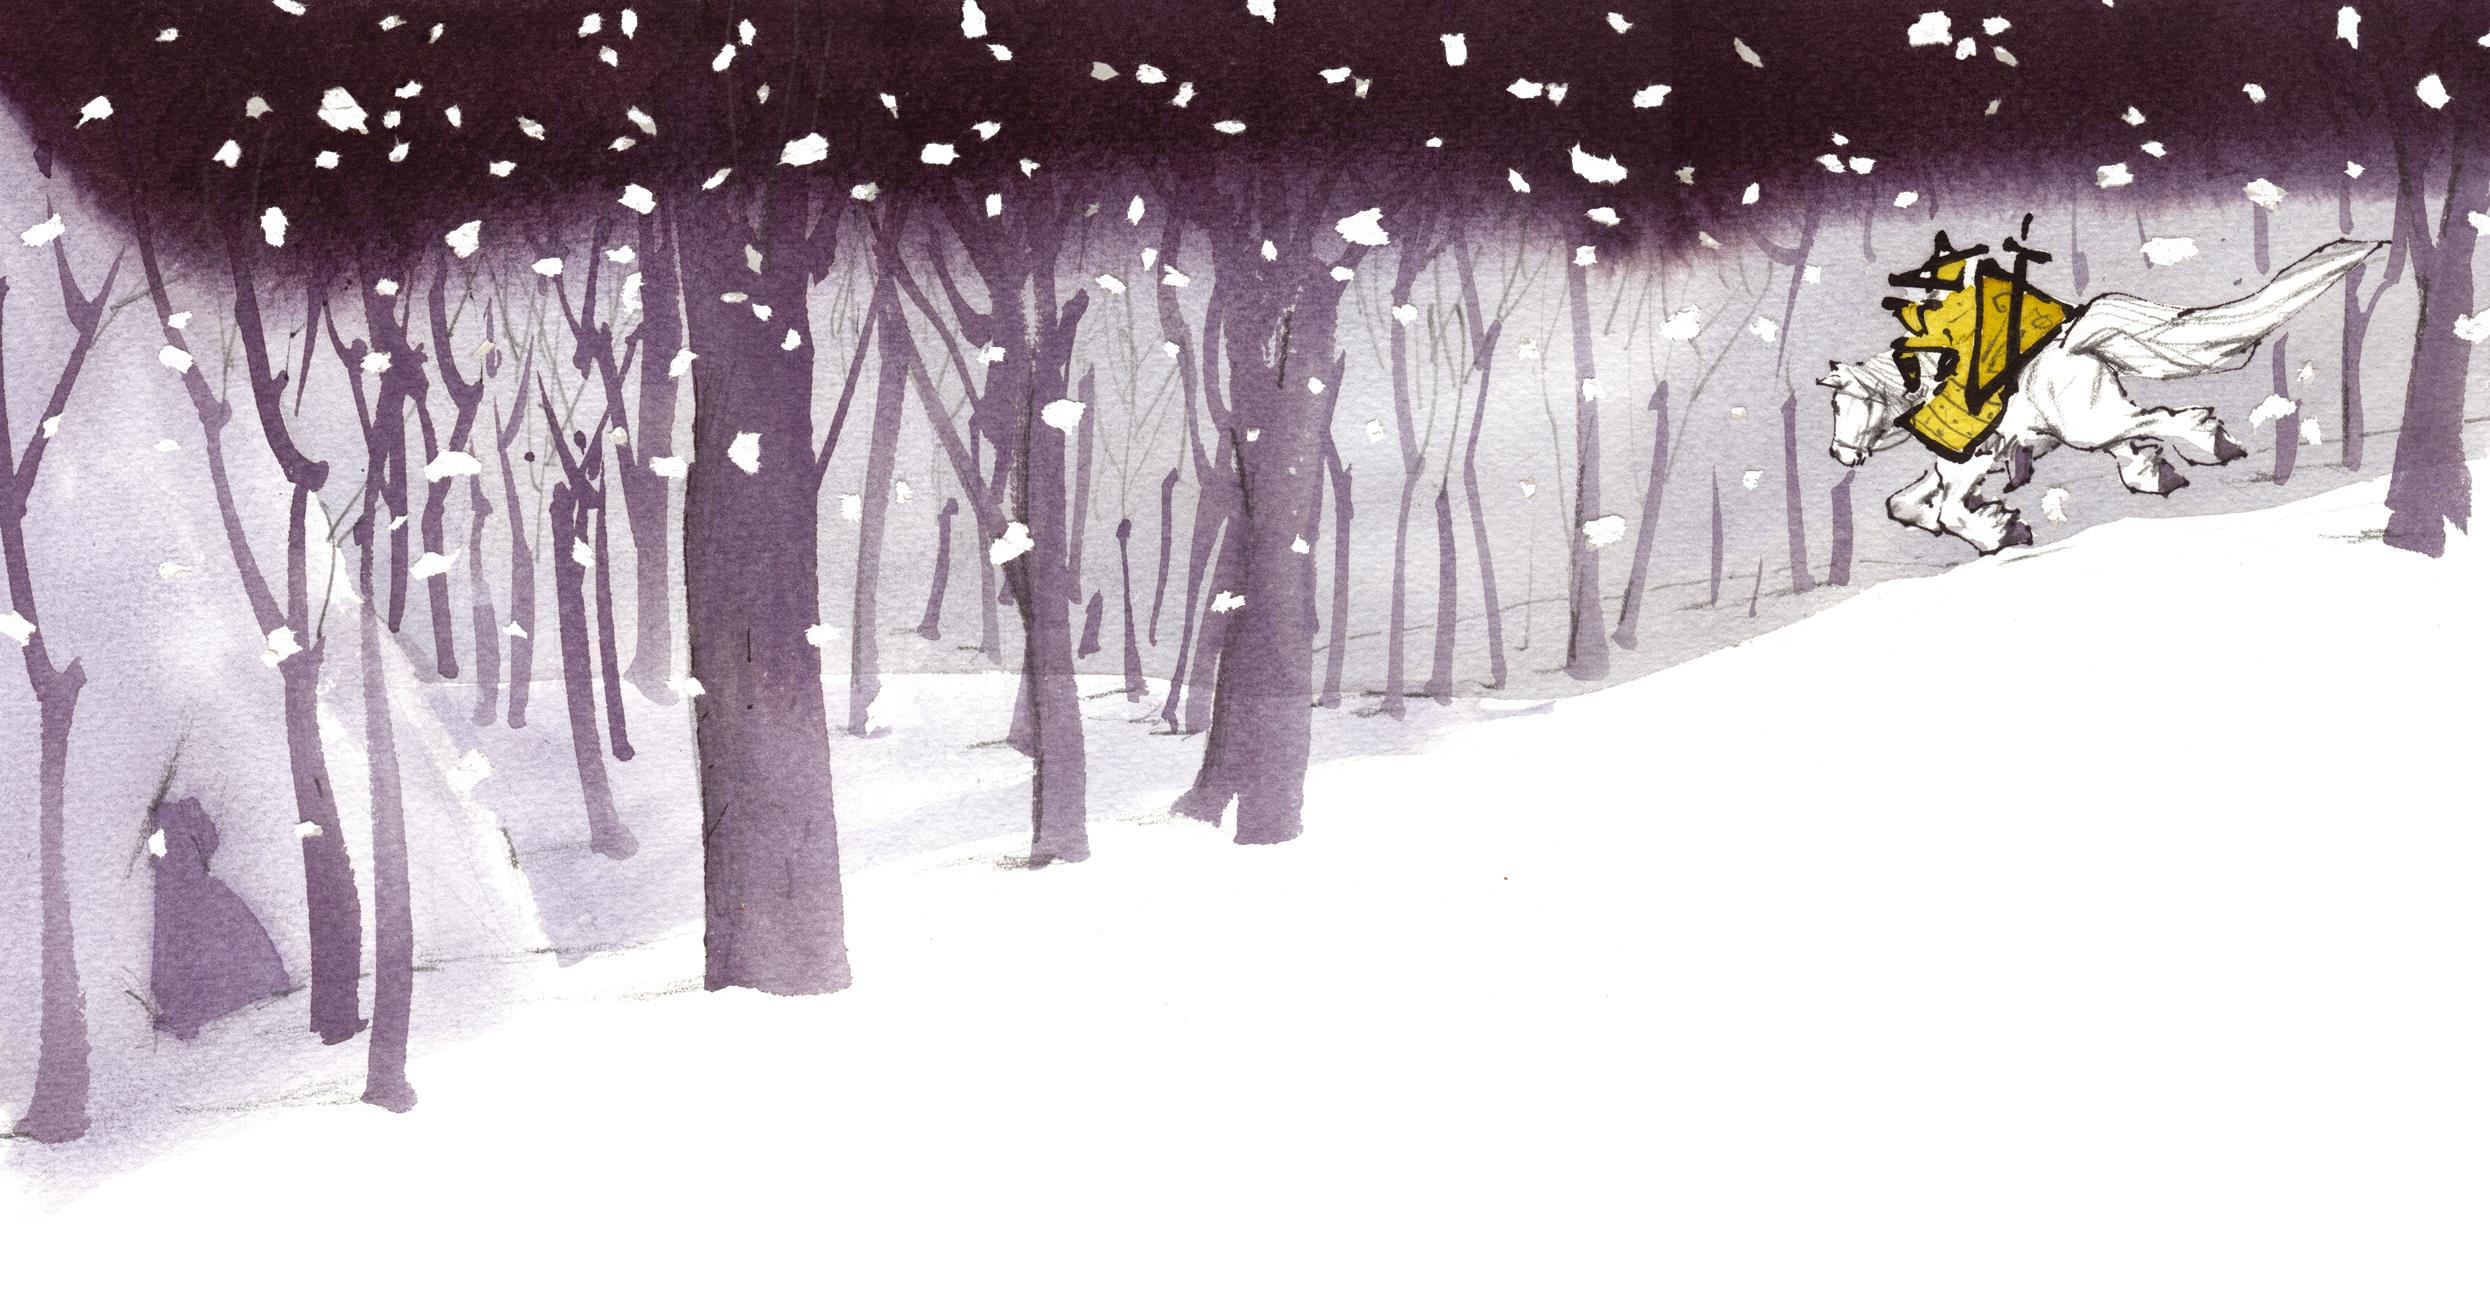 Ilustración de Jokin Mitxelena